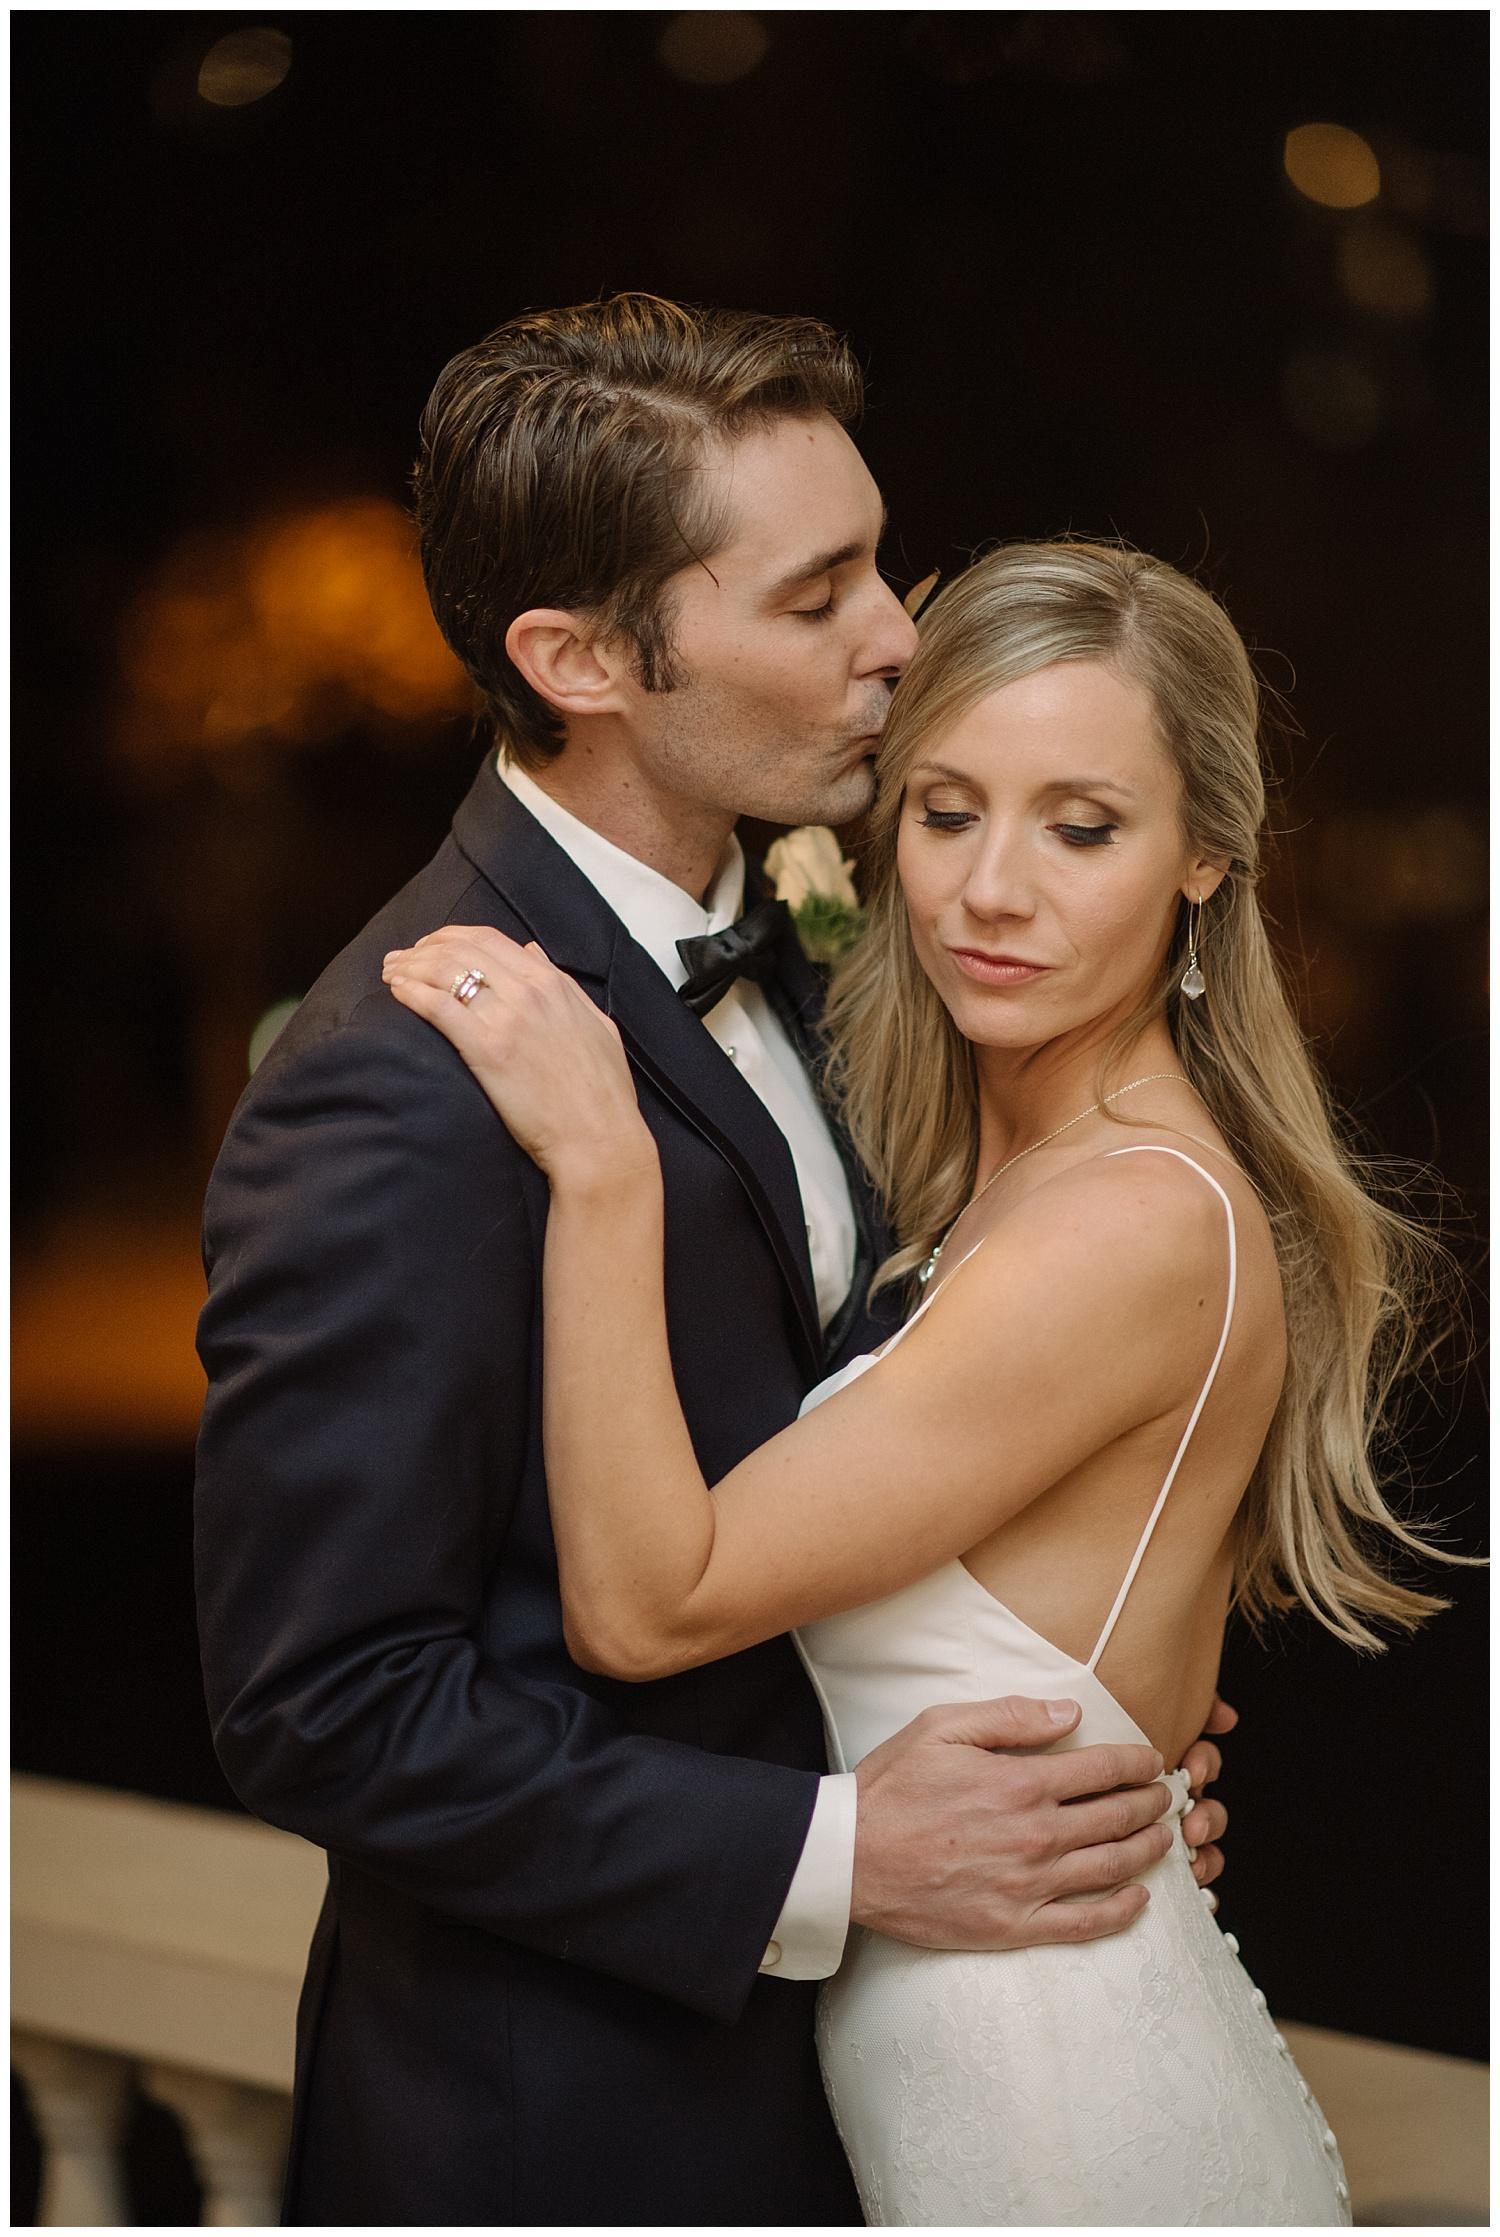 Denver_Wedding_Photographer_Grant_Humphreys_Mansion_Classic_Weddings_Photography_Urban_Romantic_025.jpg